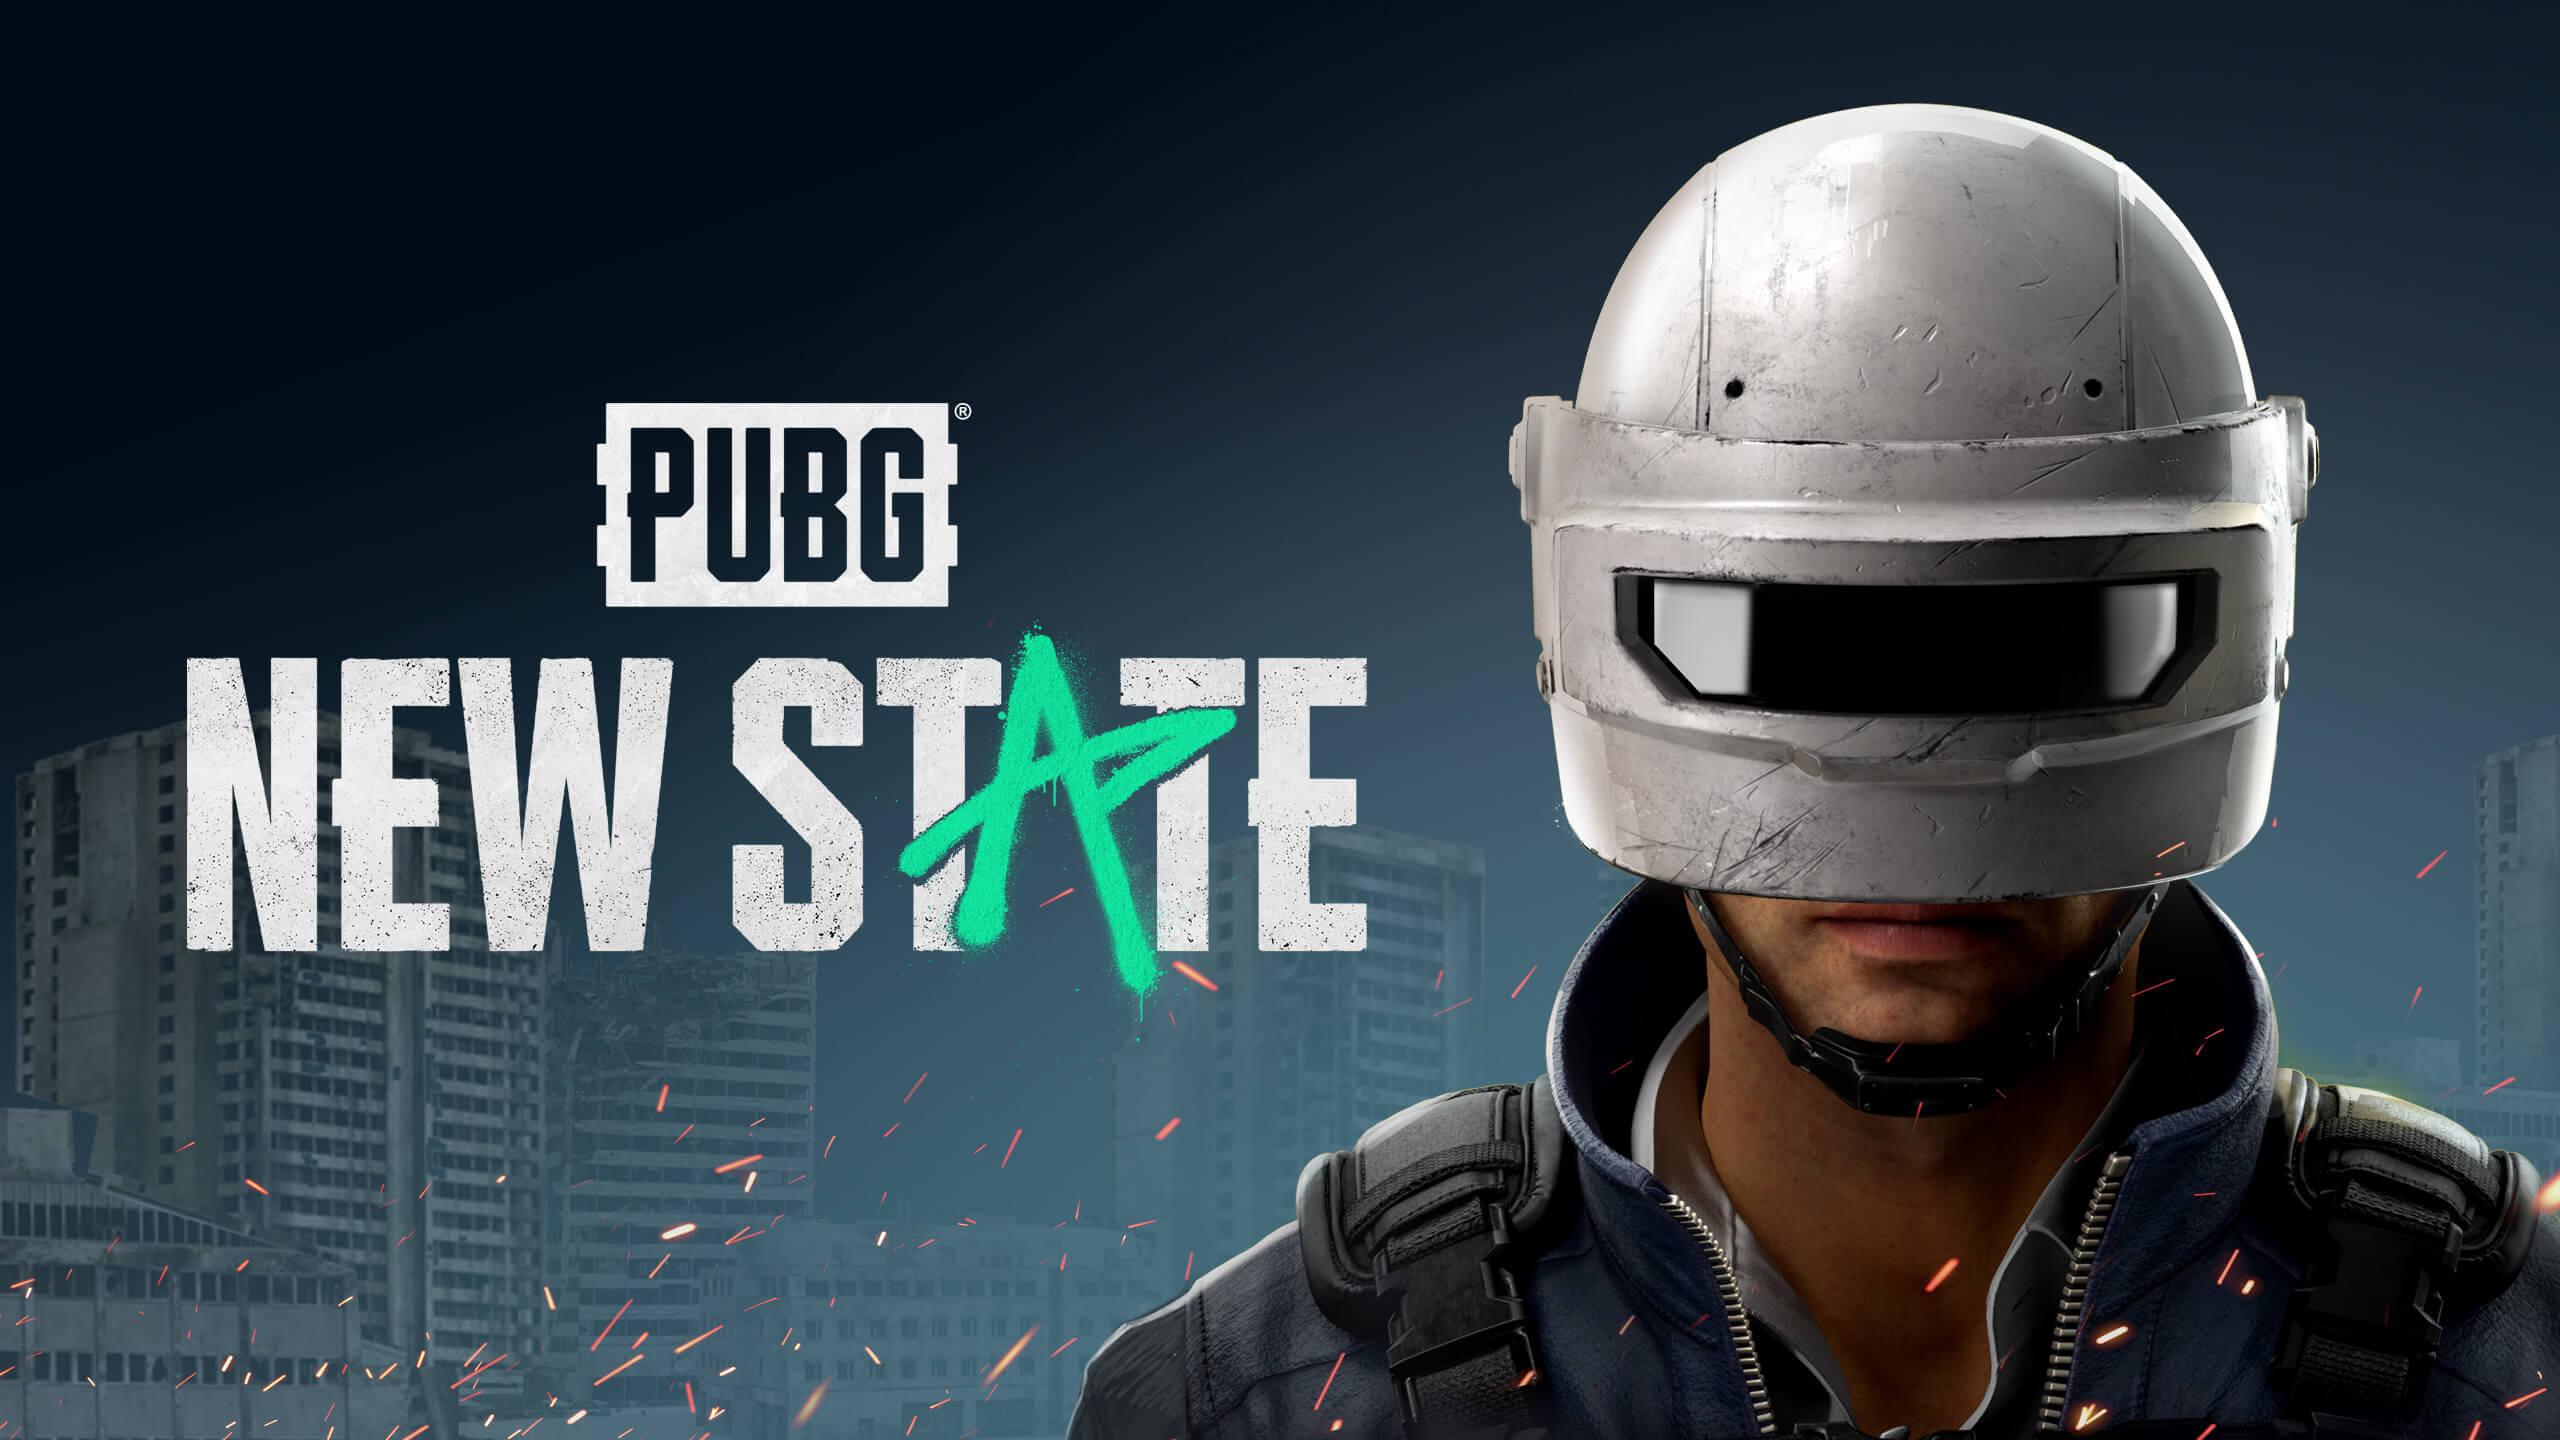 PlayerUnknown's Battlegrounds: New State